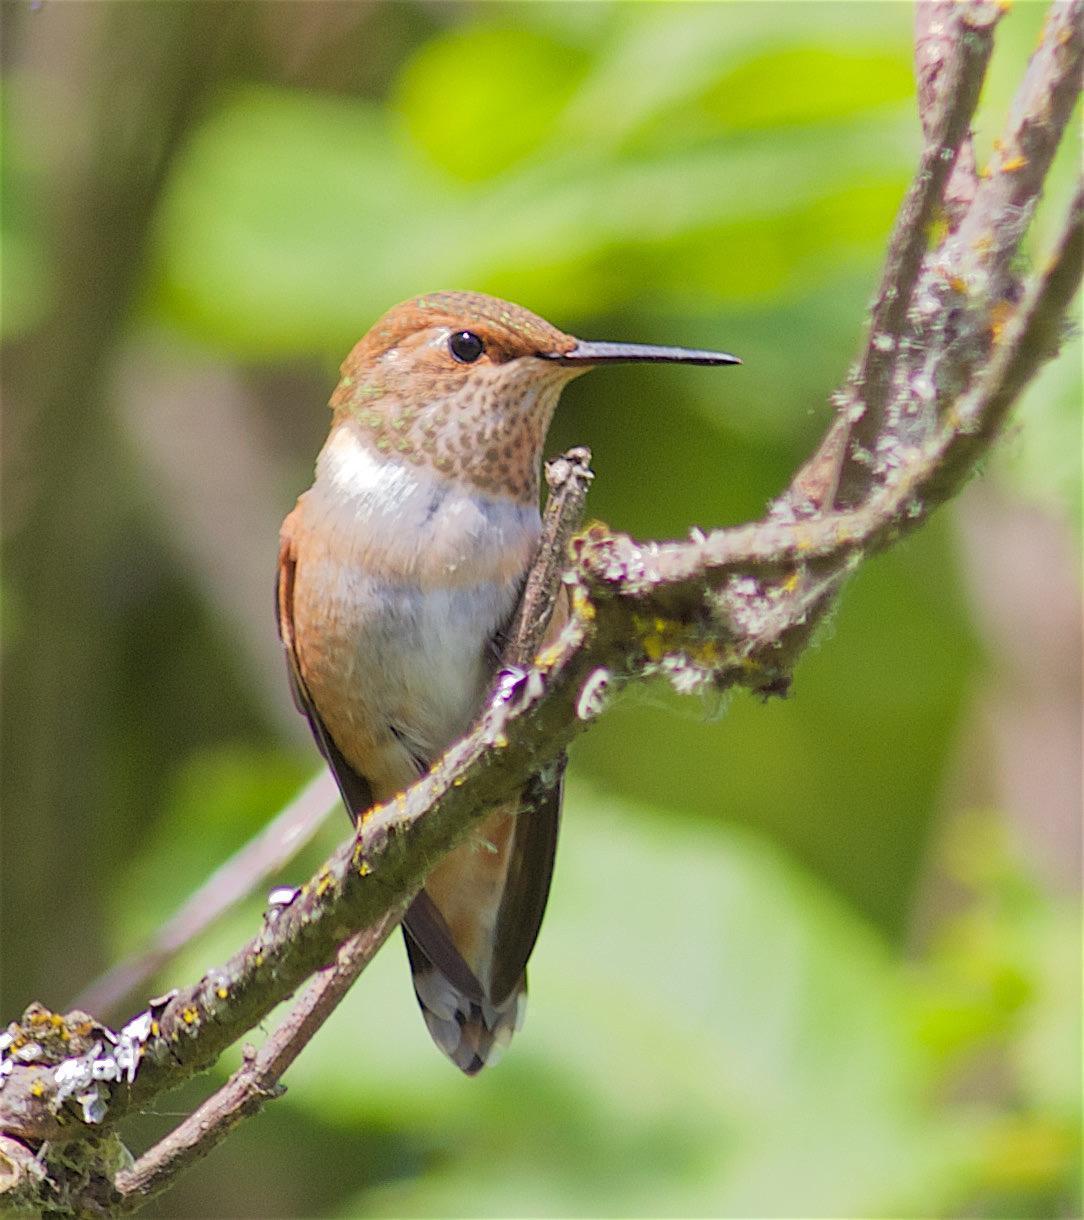 Rufous Hummingbird Photo by Kathryn Keith